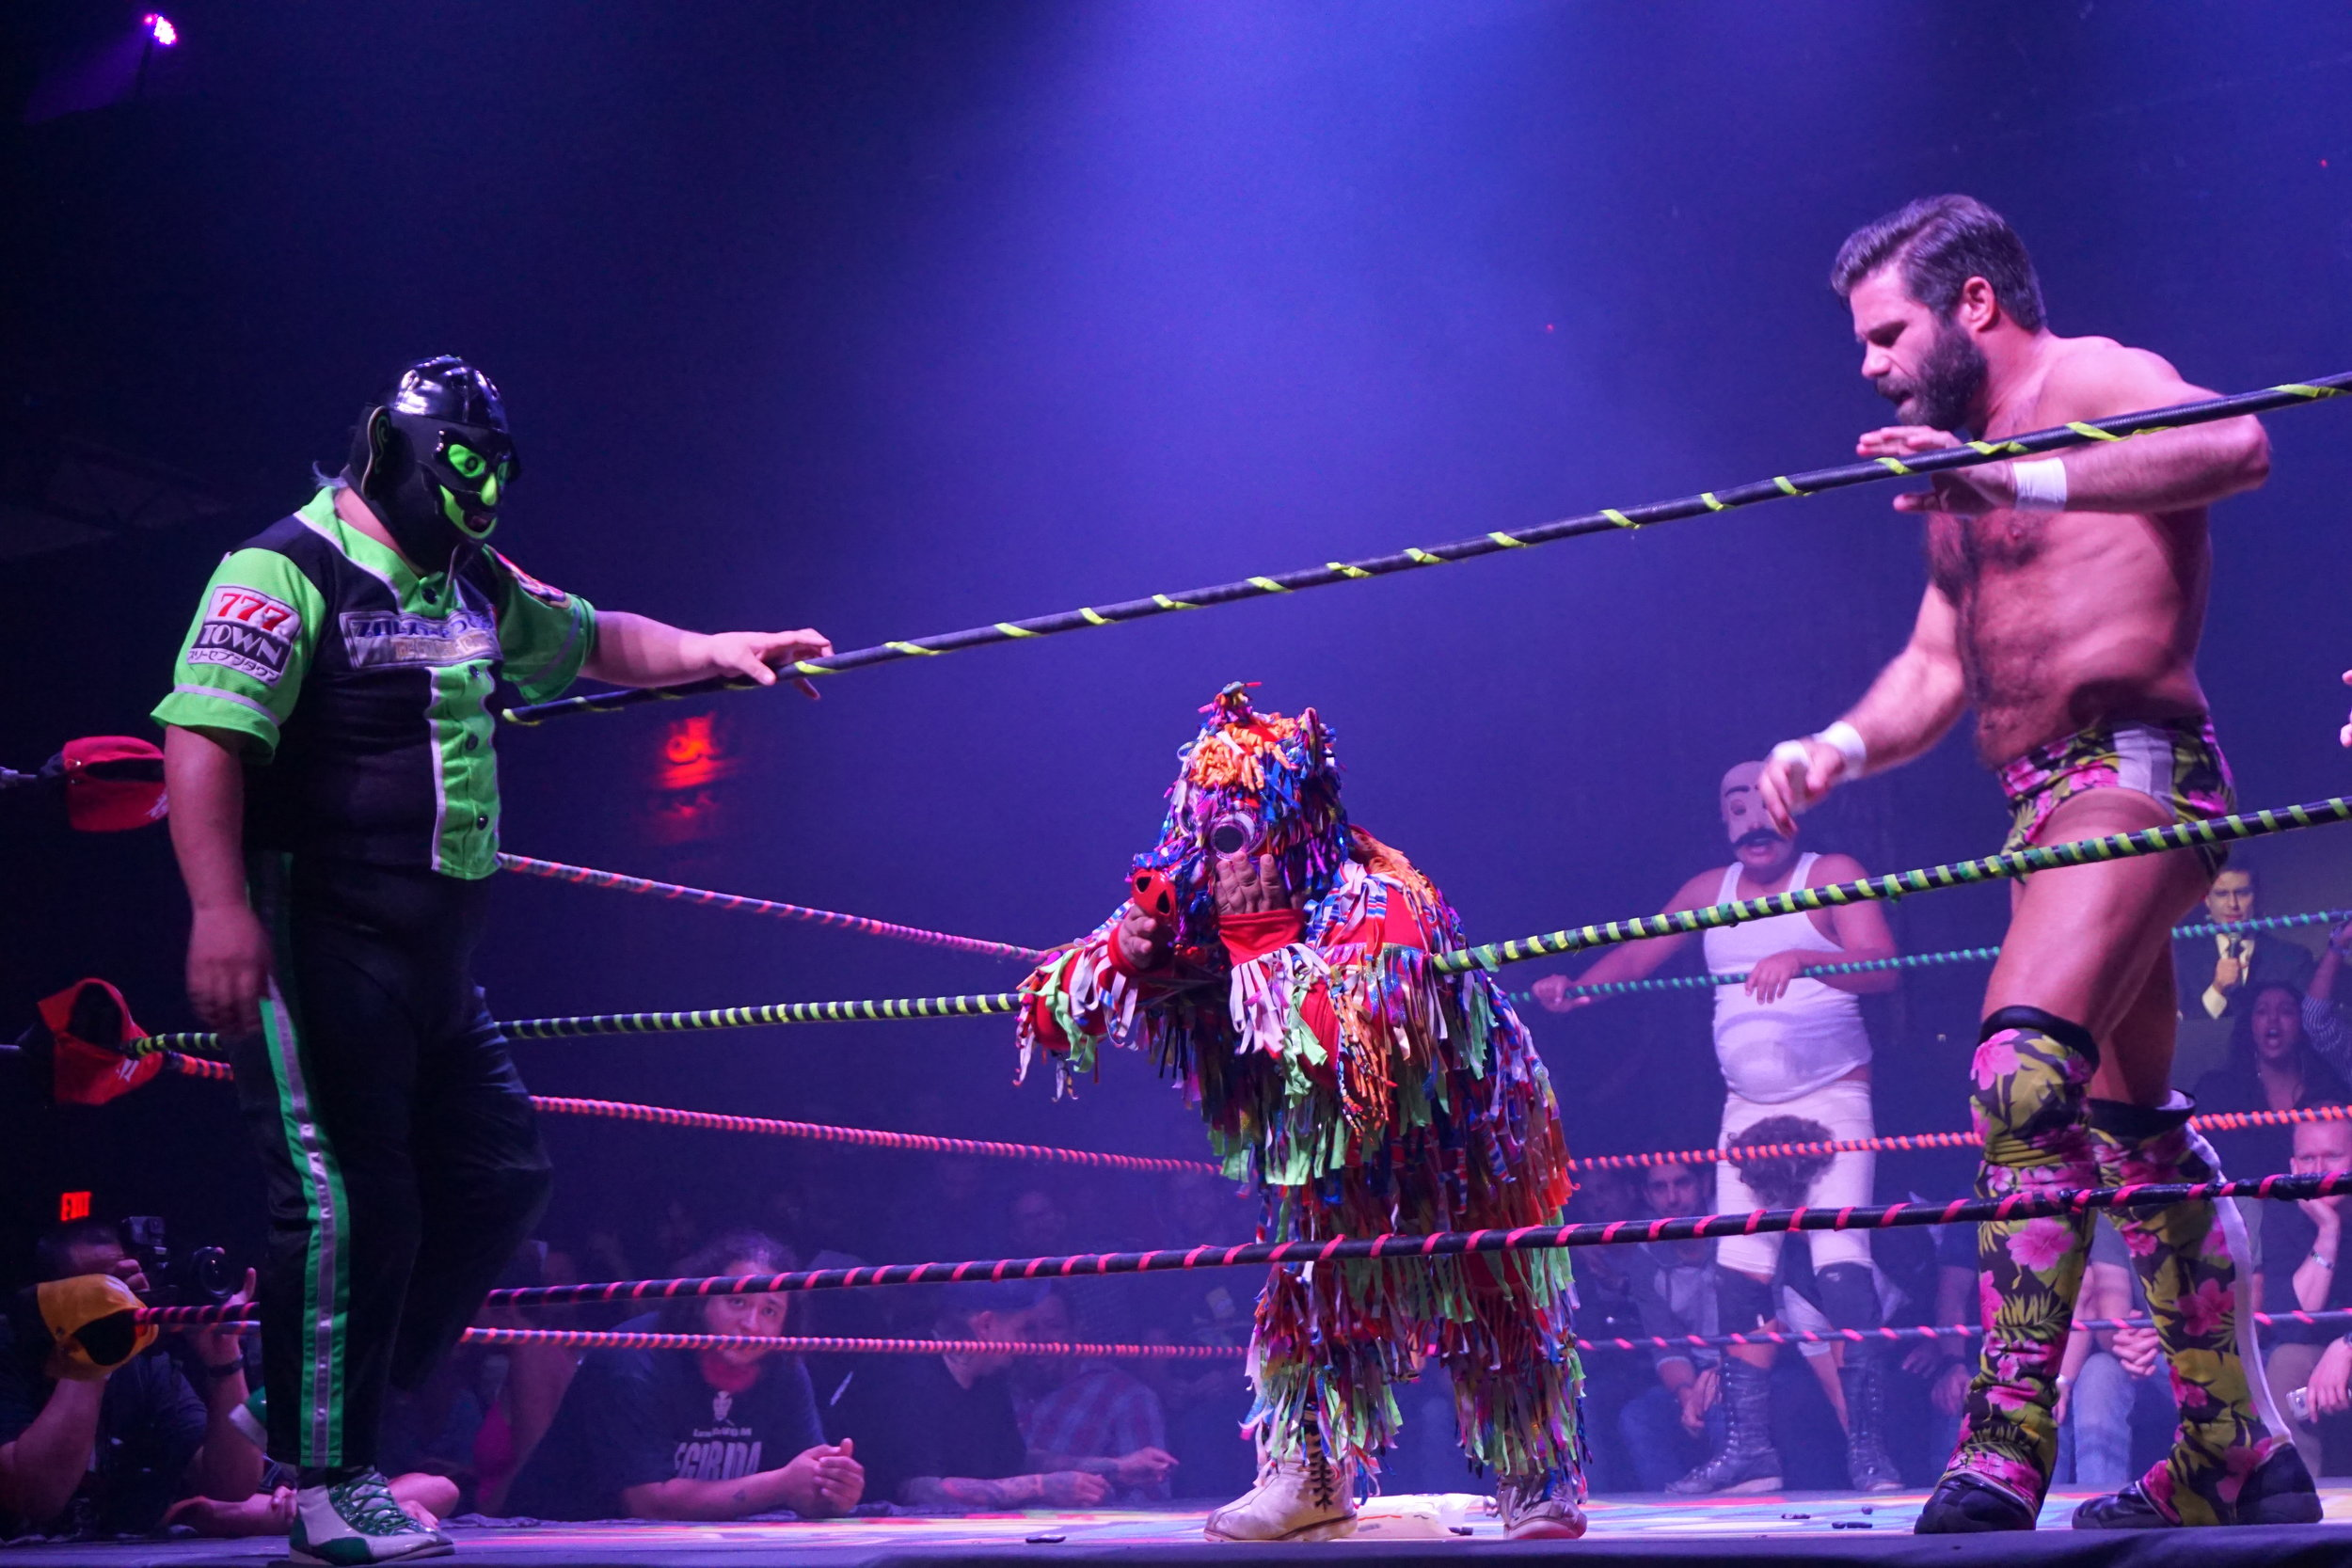 Kikutaro, Piñatita, Dirty Sanchez, and Joey Ryan by Andrea Antolini